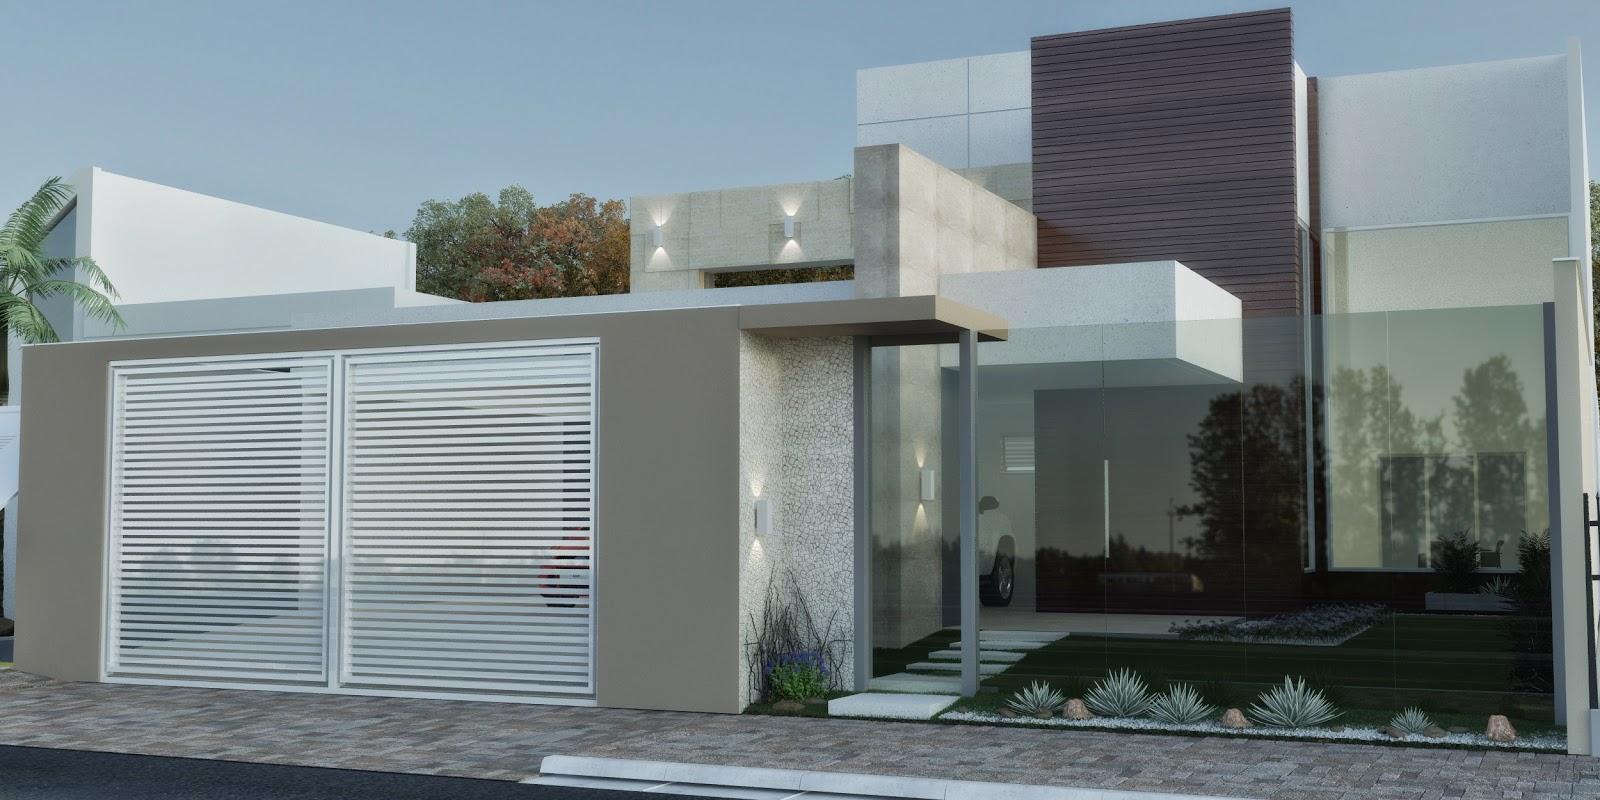 3dsul maquete eletr nica 3d projeto e fachada de casa for Todo para casa